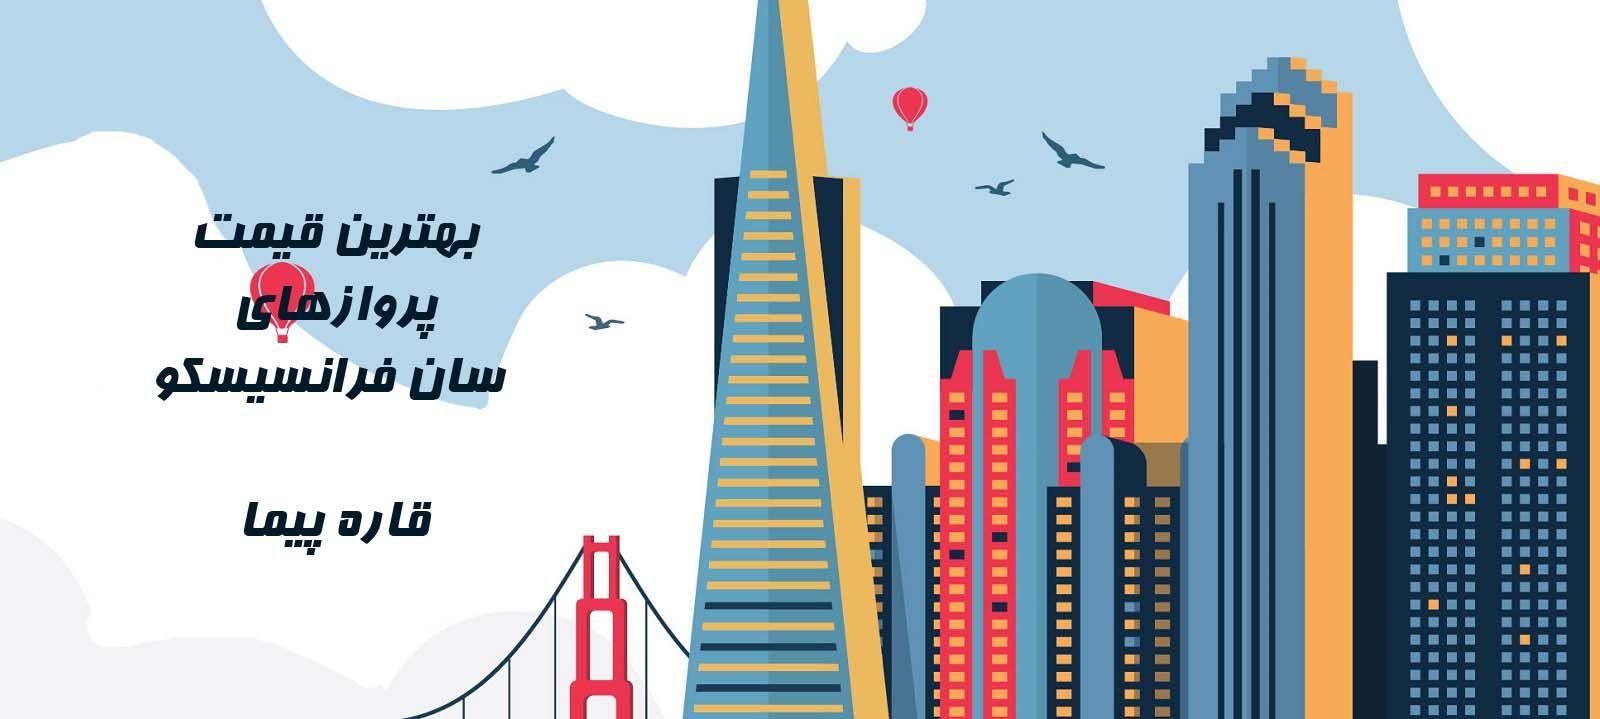 قیمت بلیط هواپیما سان فرانسیسکو